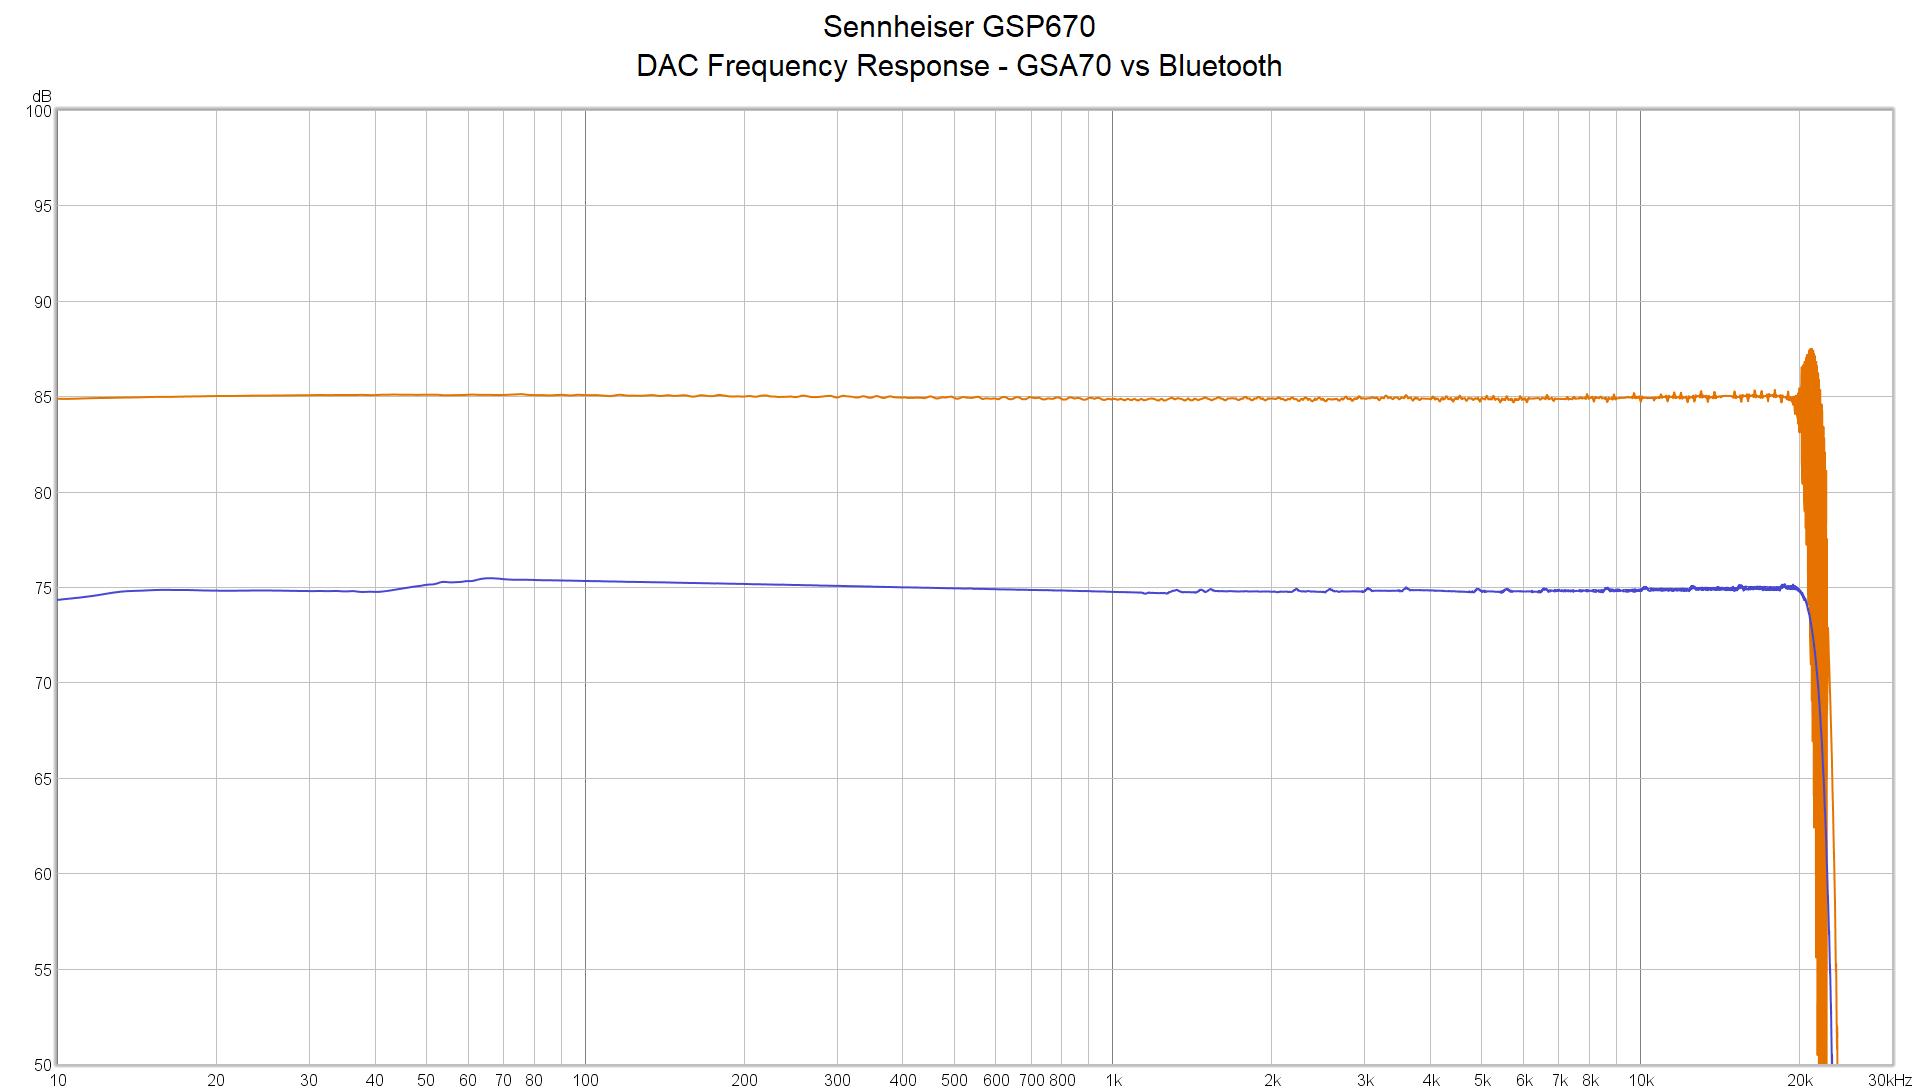 DAC Quality Investigation - The Sennheiser GSP670 Wireless